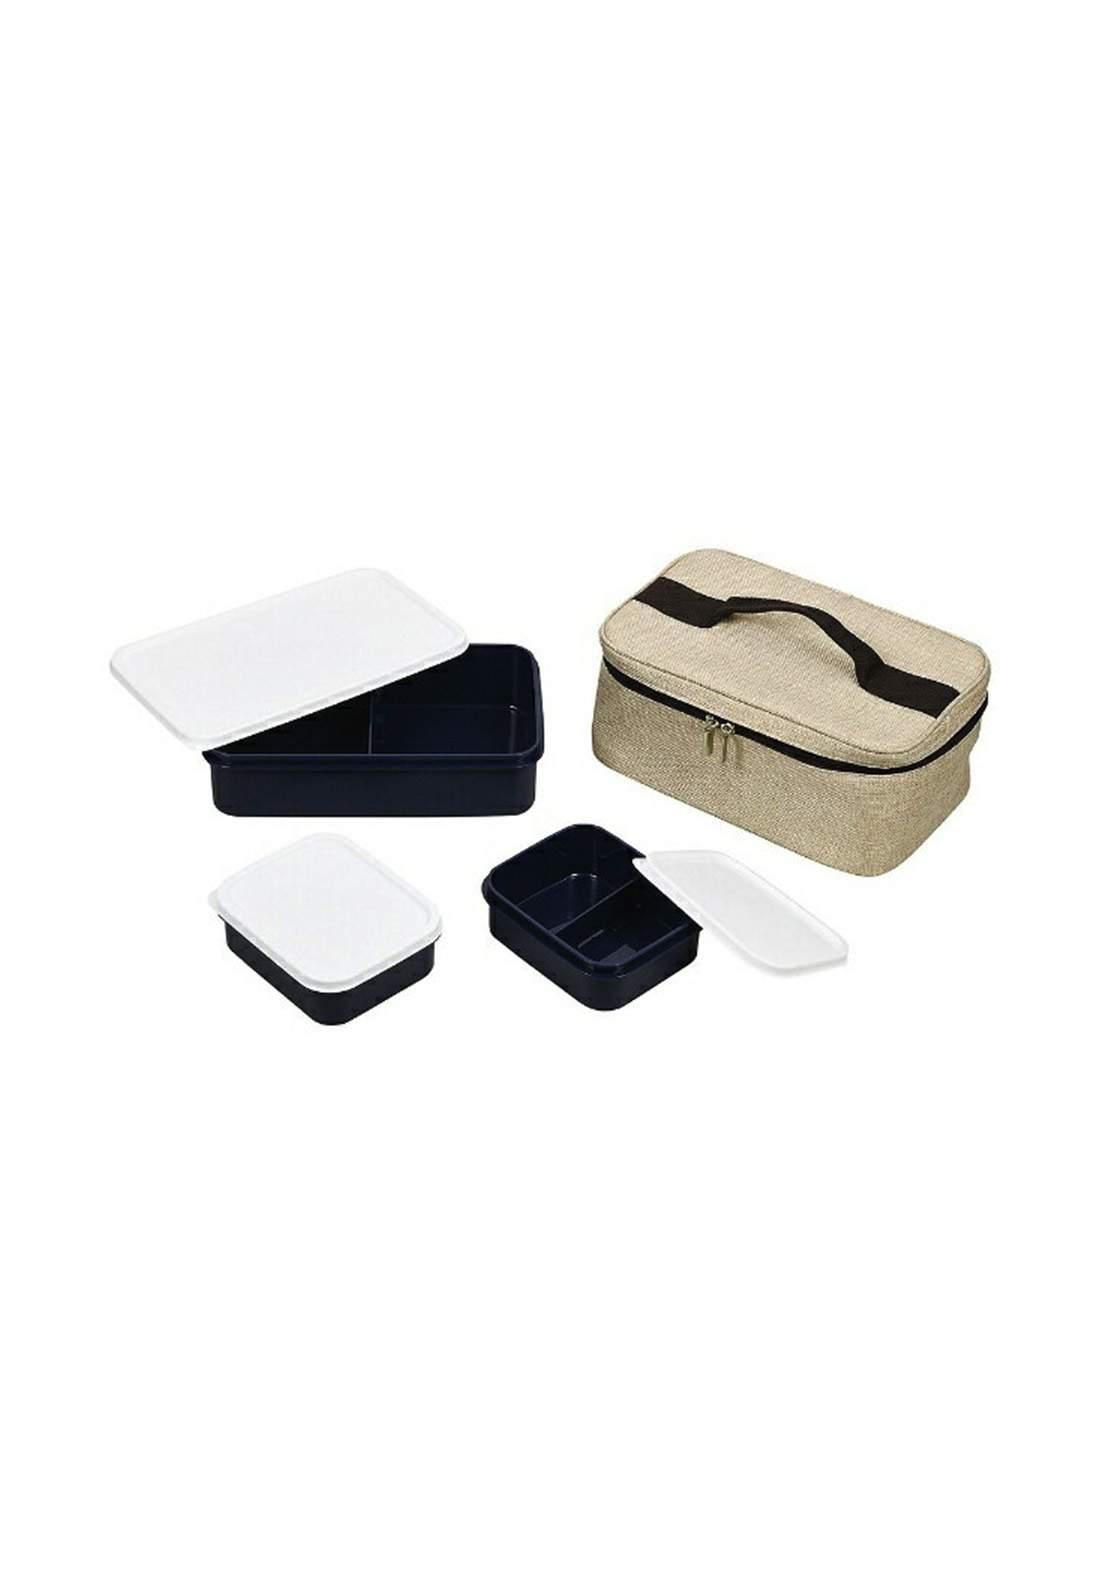 Pearl Metal  D-6374 Bento Box, Denim  Lunch Box Set with Bag صندوق طعام مع حقيبة